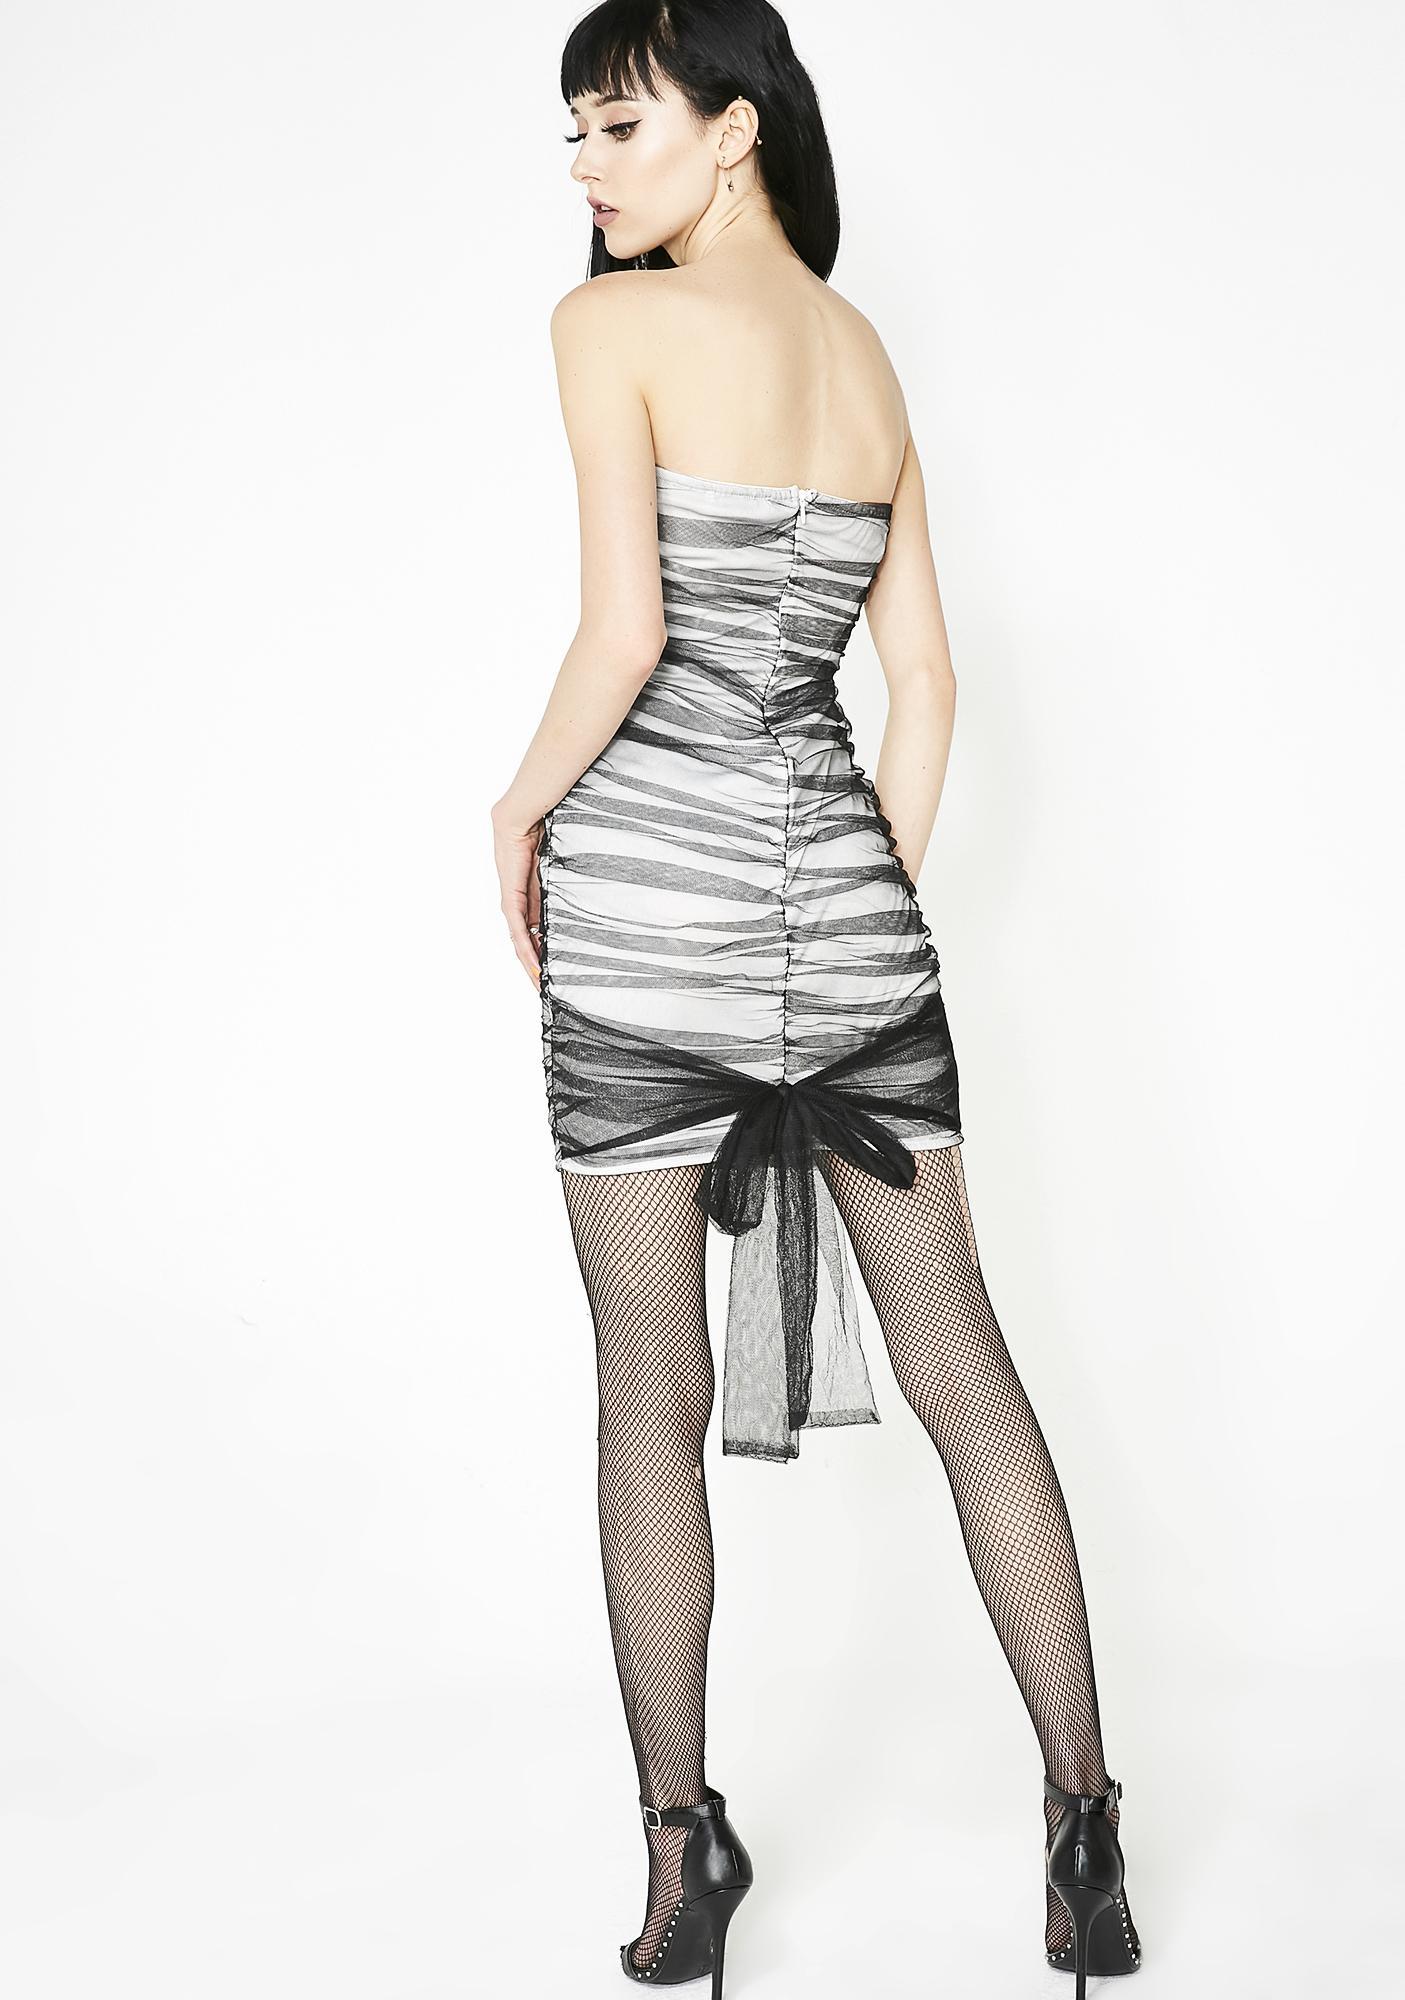 ZYA Valentina Dress